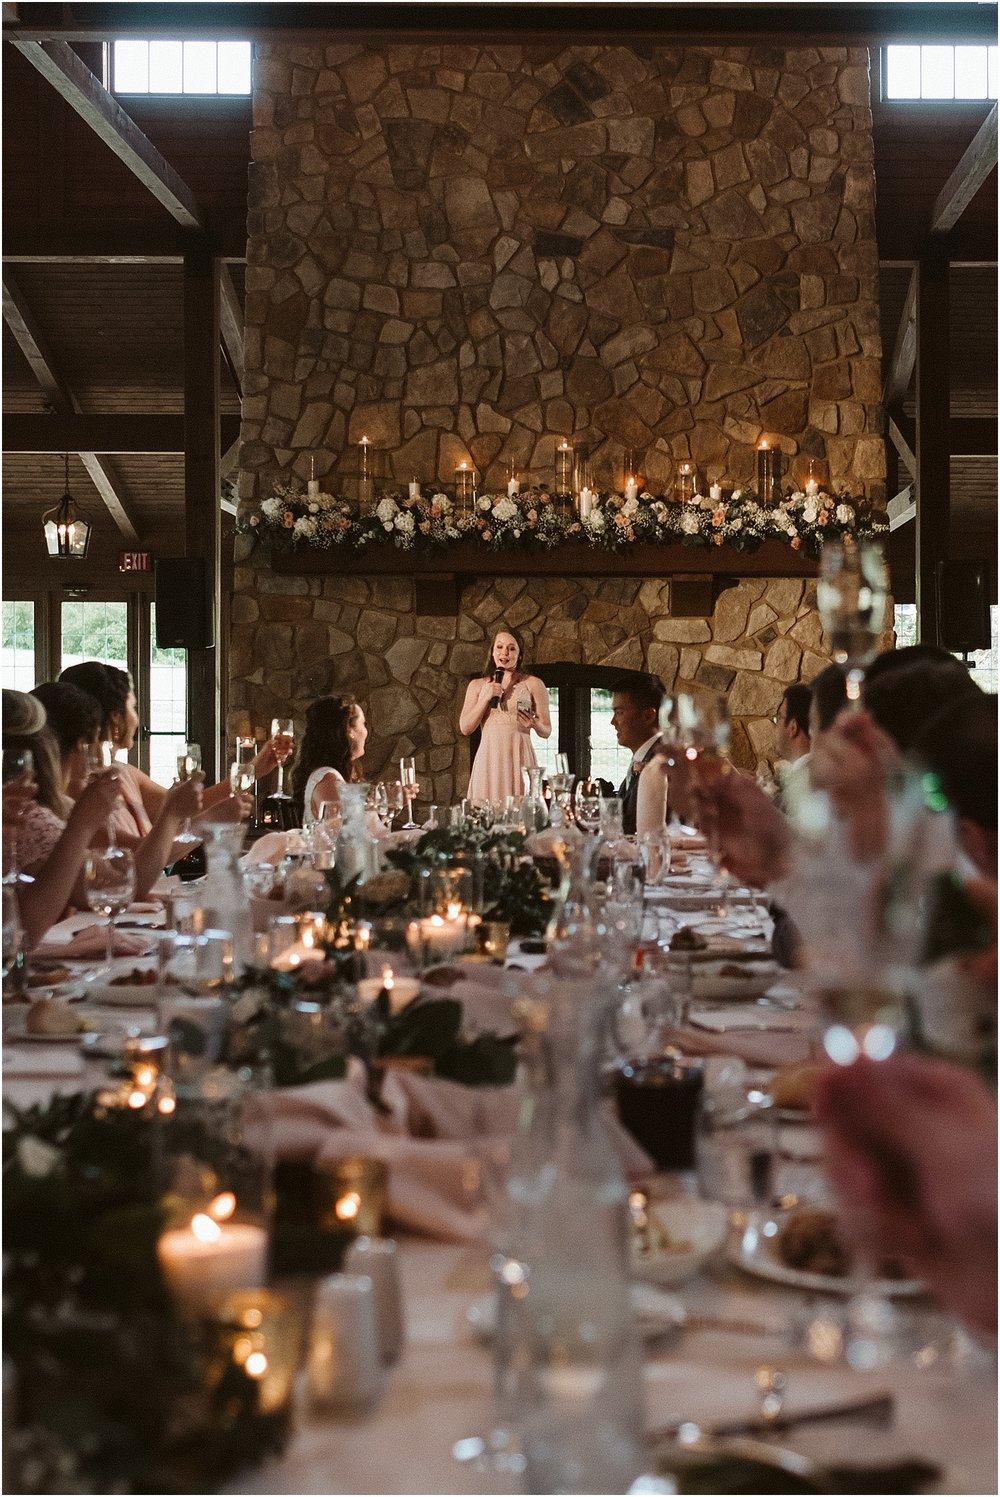 S_A_Chicago_Area_Rockford_Rustic_Joyful_Vibrant_Wedding_0131.jpg